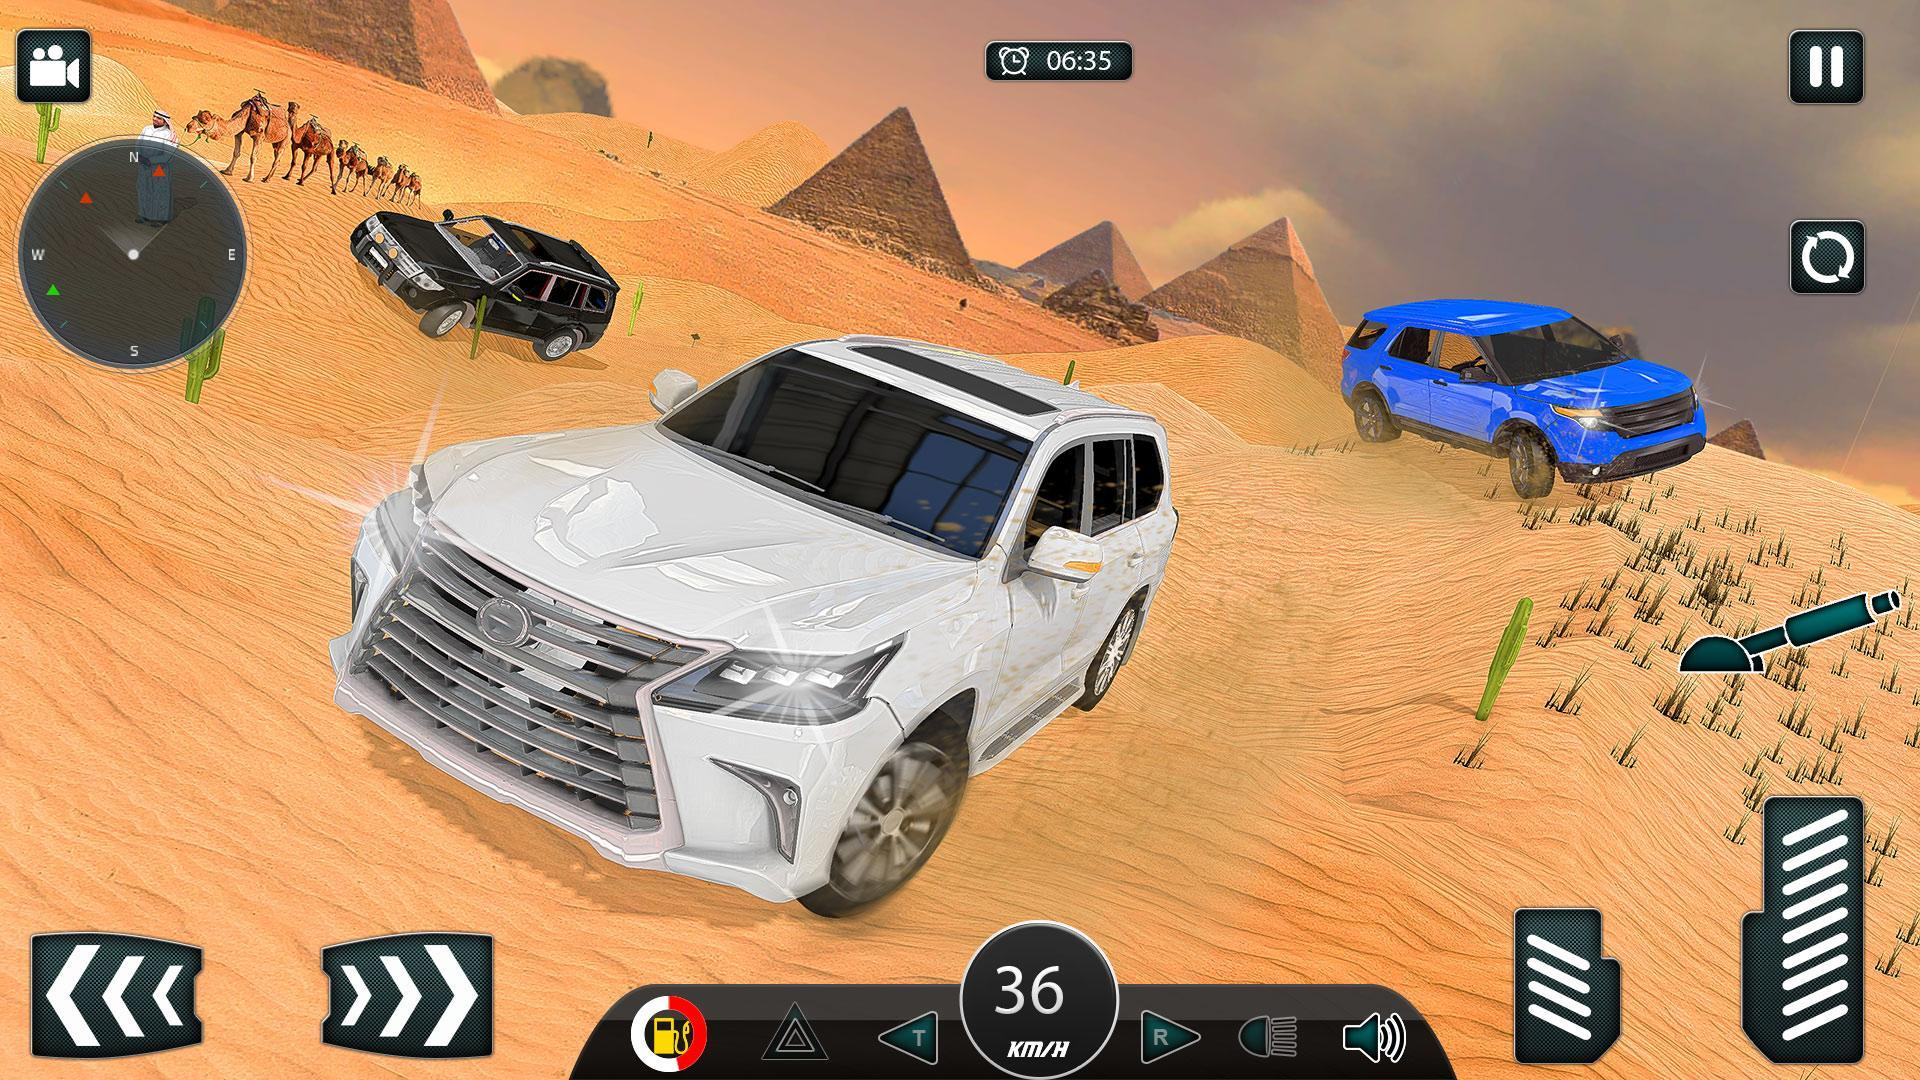 Luxury LX Prado Desert Driving screenshot 9